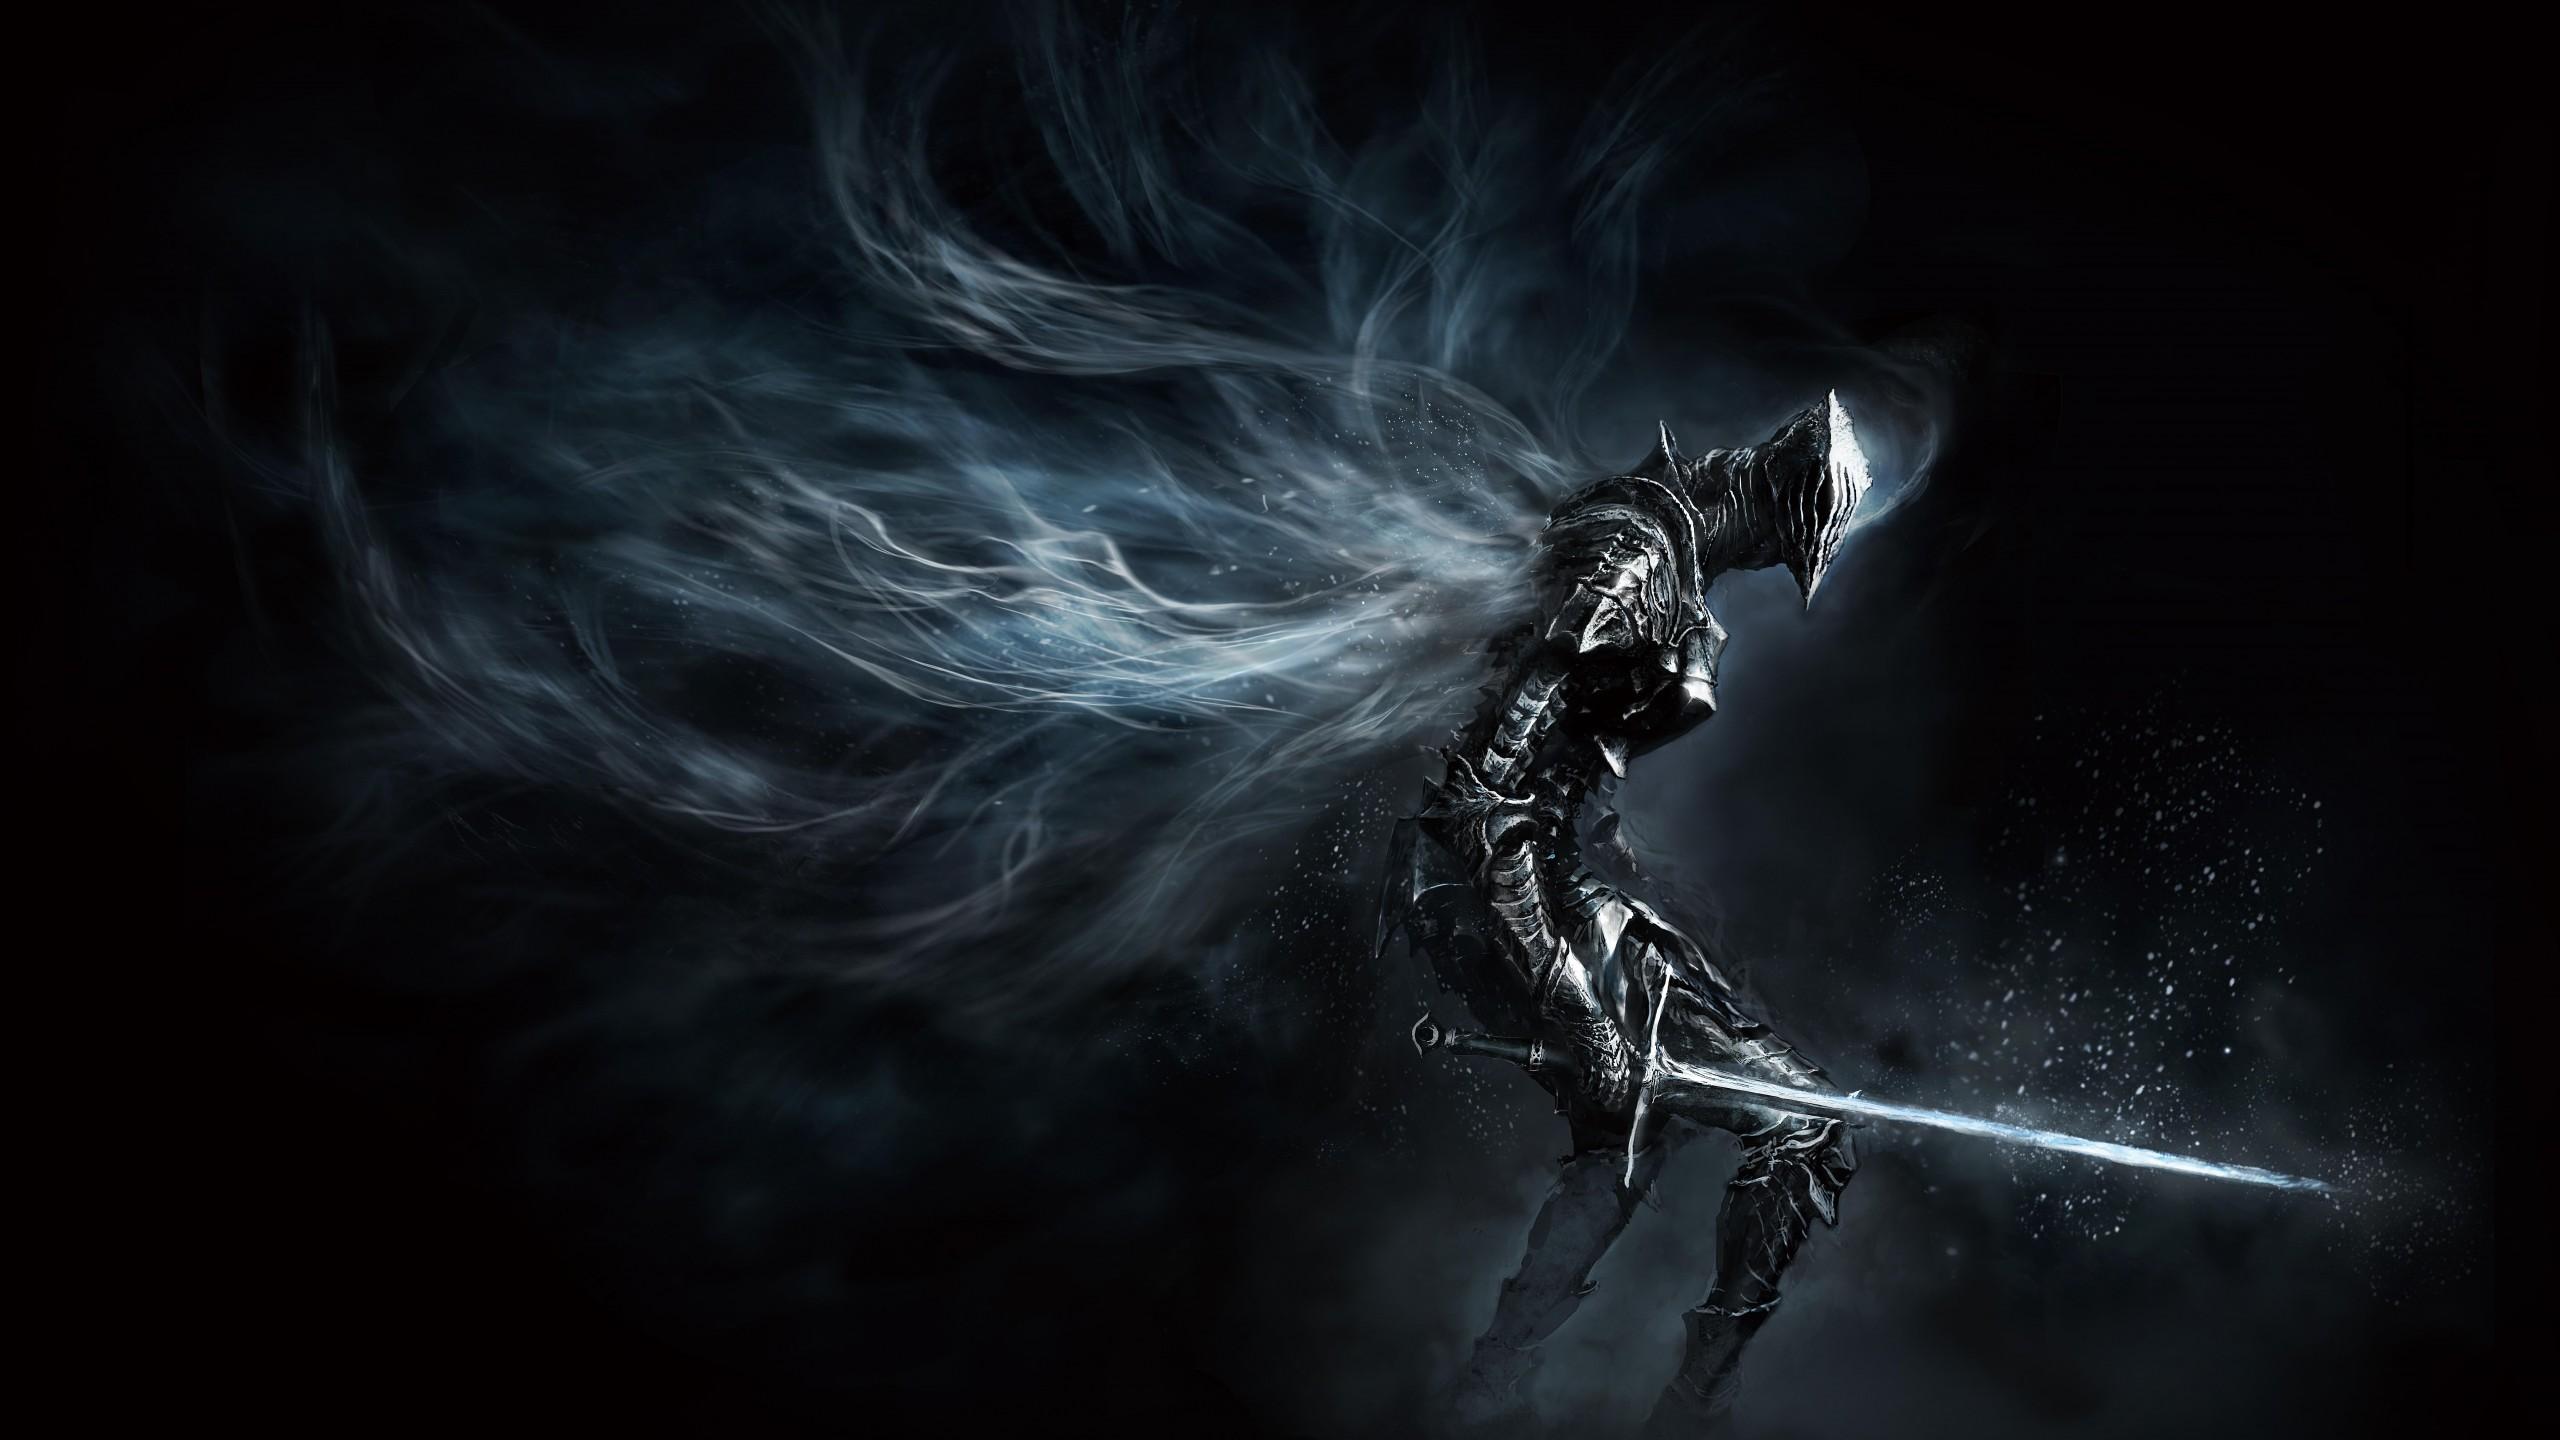 HQ Black Knight Wallpapers   File 343.21Kb